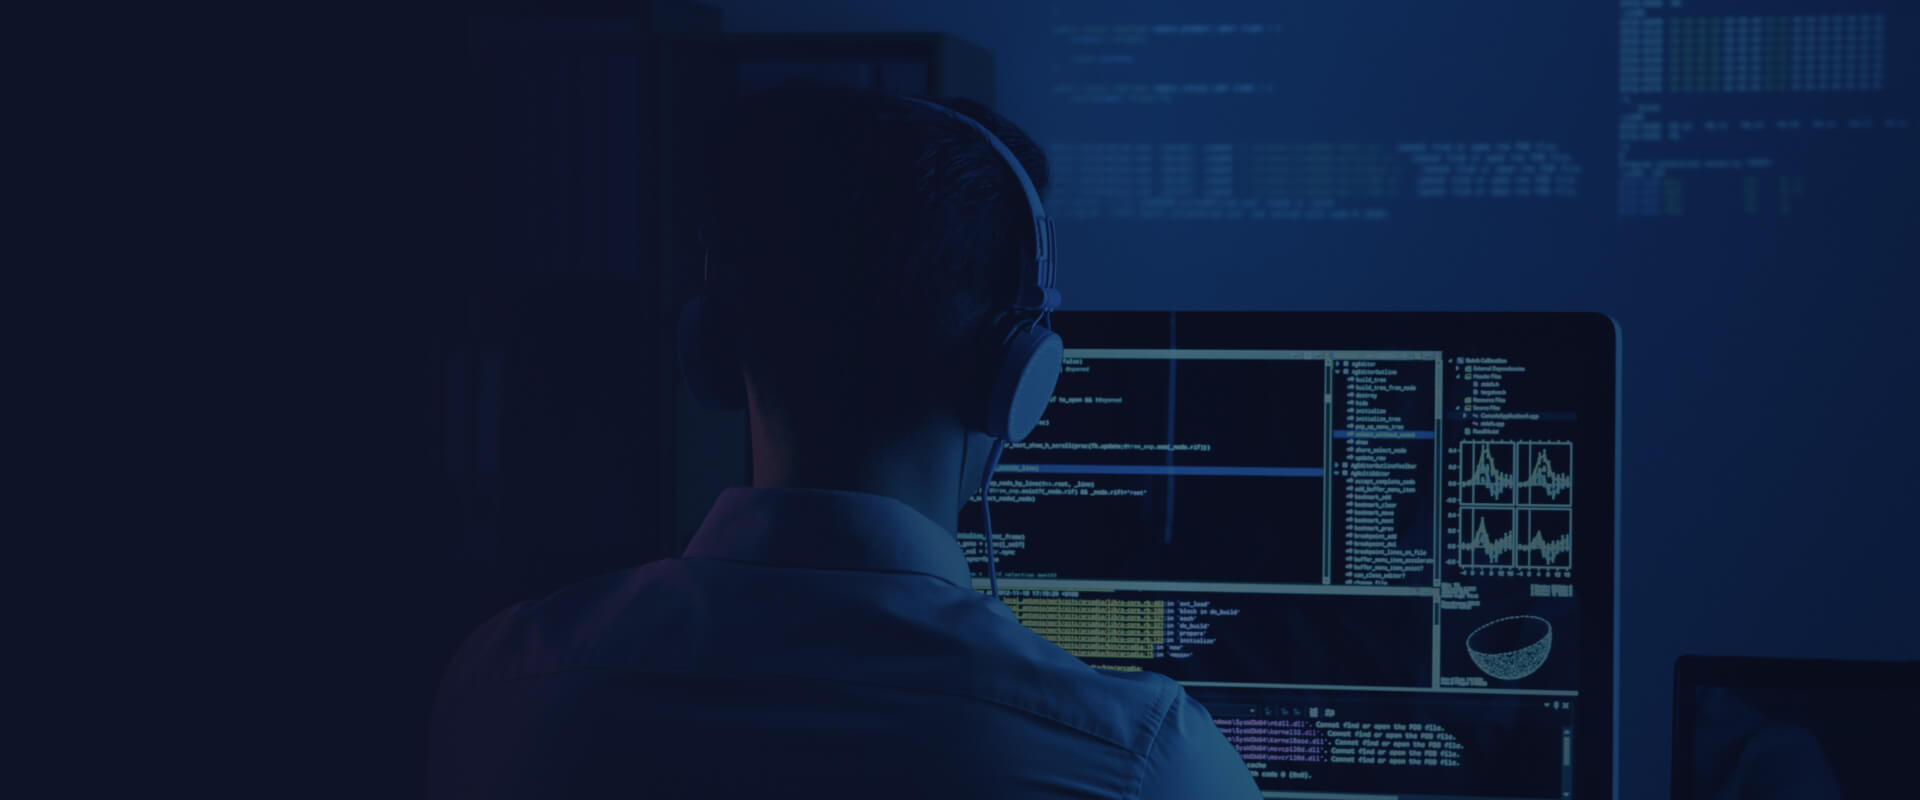 https://pixelplex.io/next/images/web-development/web-development